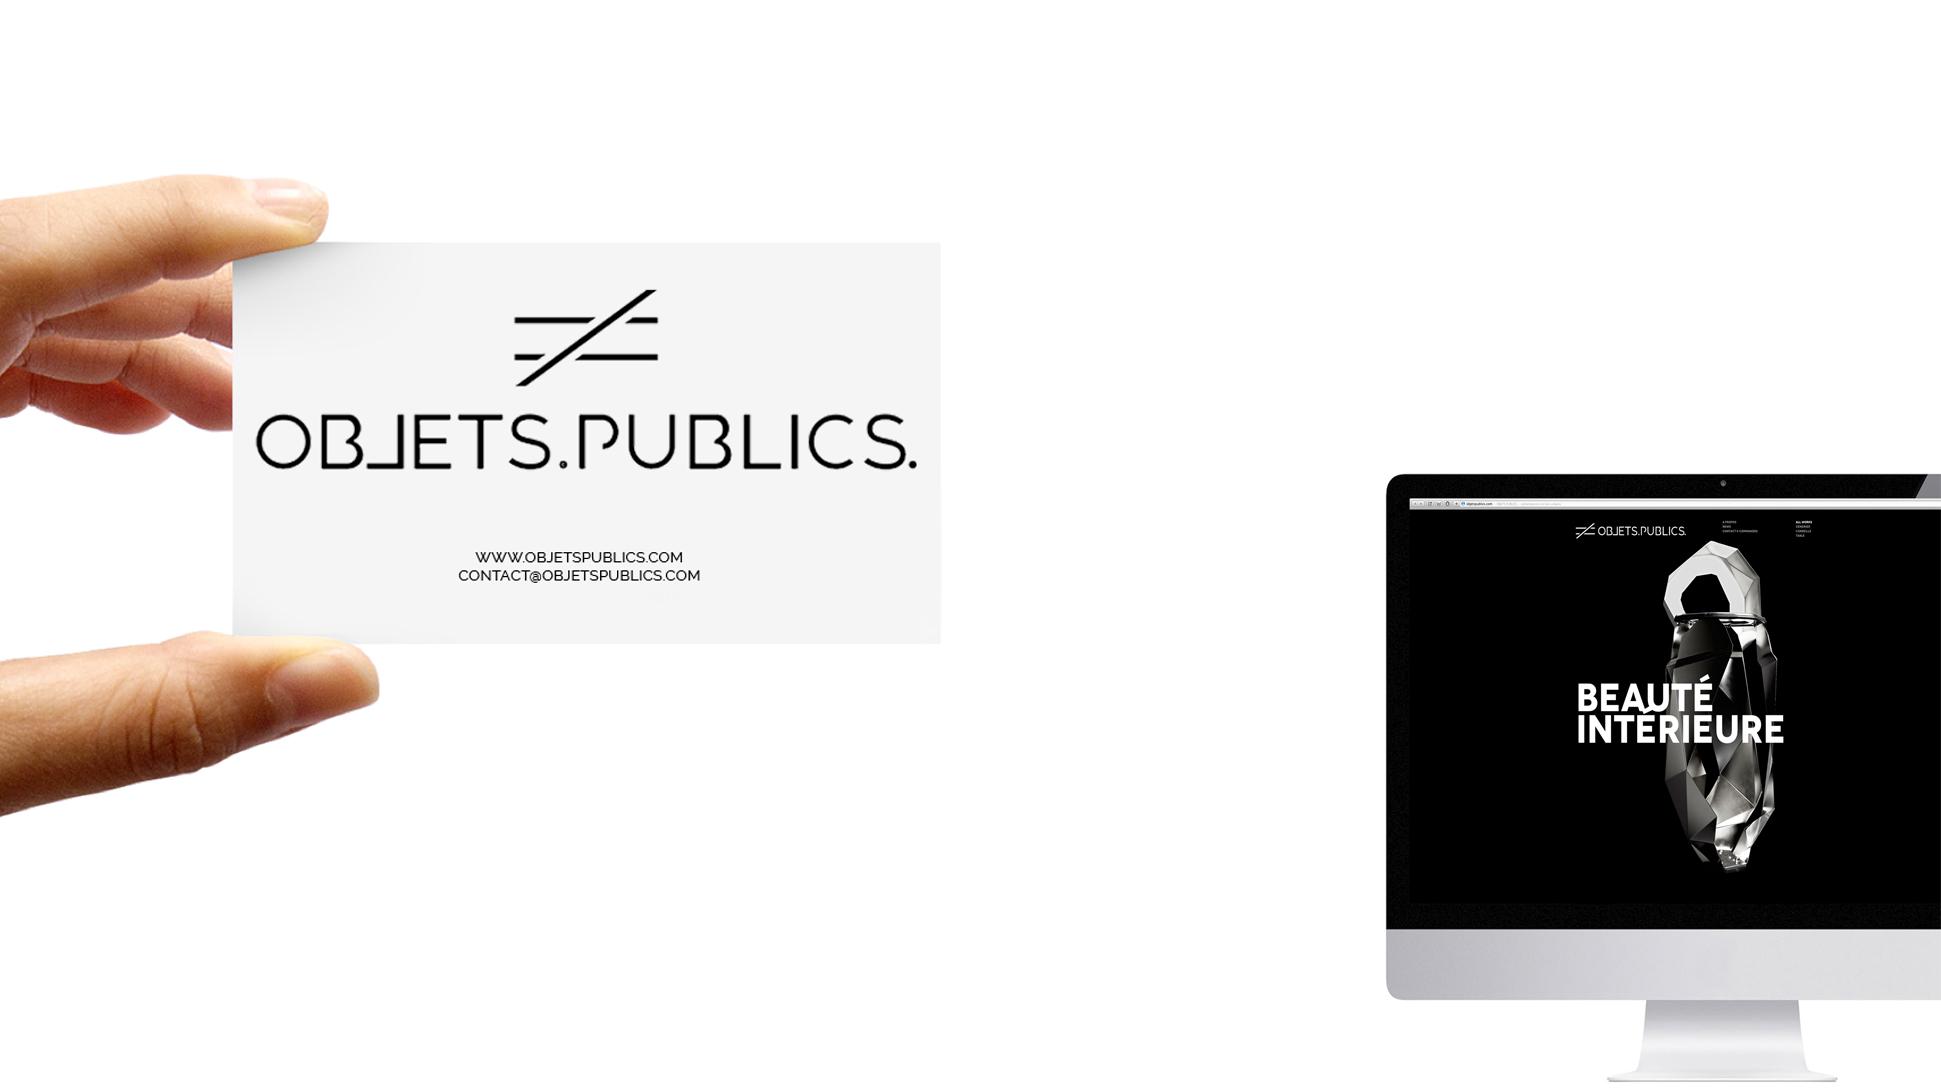 objets-publics-5